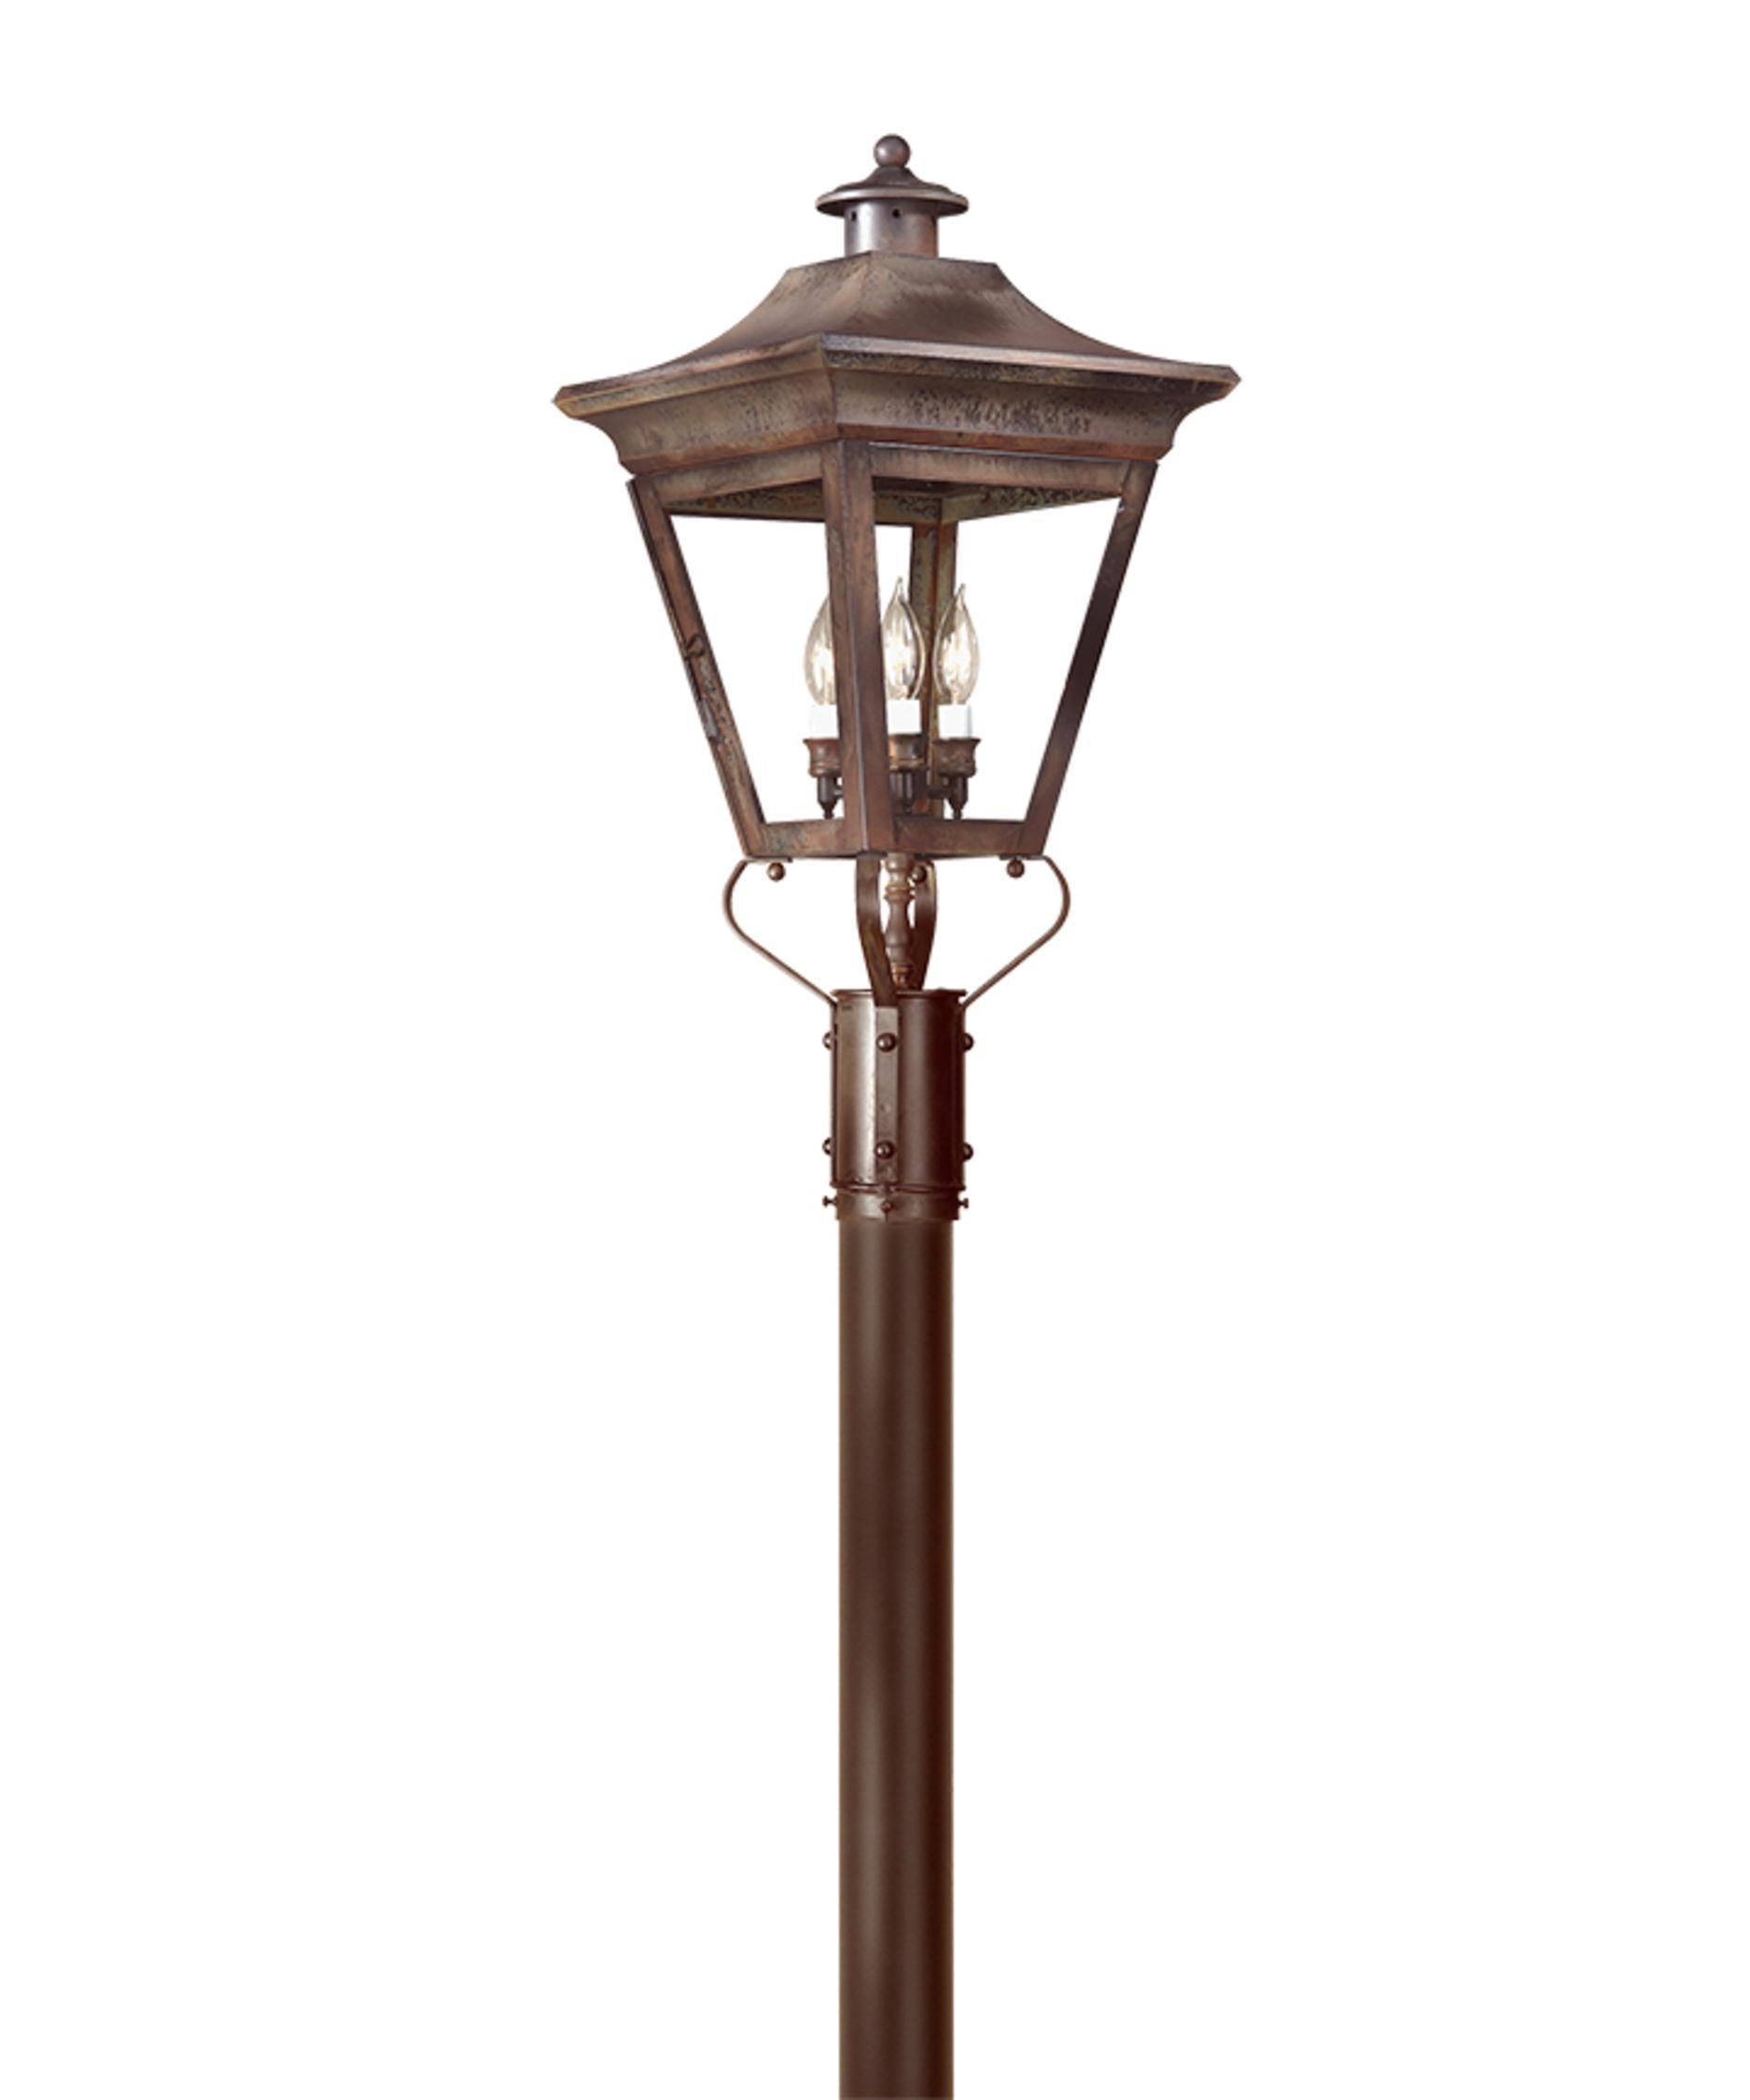 lighting p8934 oxford 3 light outdoor post lamp capitol lighting. Black Bedroom Furniture Sets. Home Design Ideas